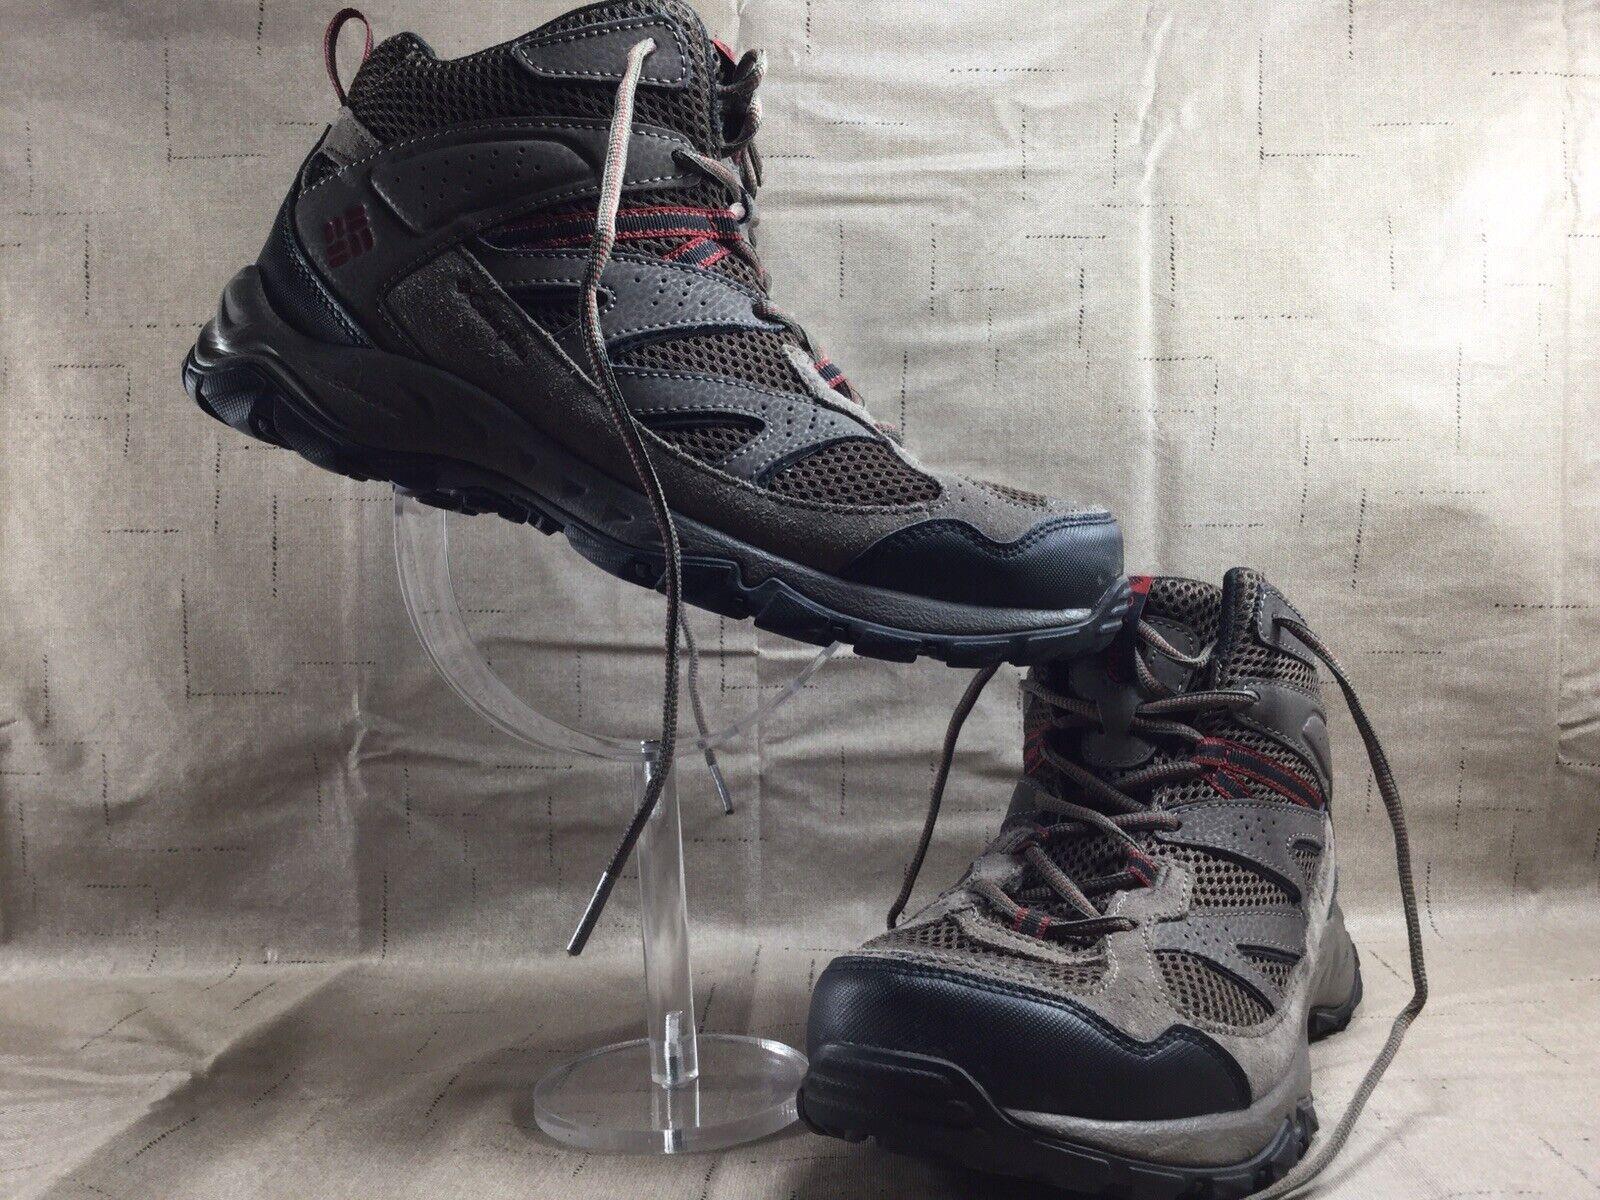 Men's Columbia Plains Ridge Brown Mid Hiking shoes BM3982-230 size 9 [SB06]